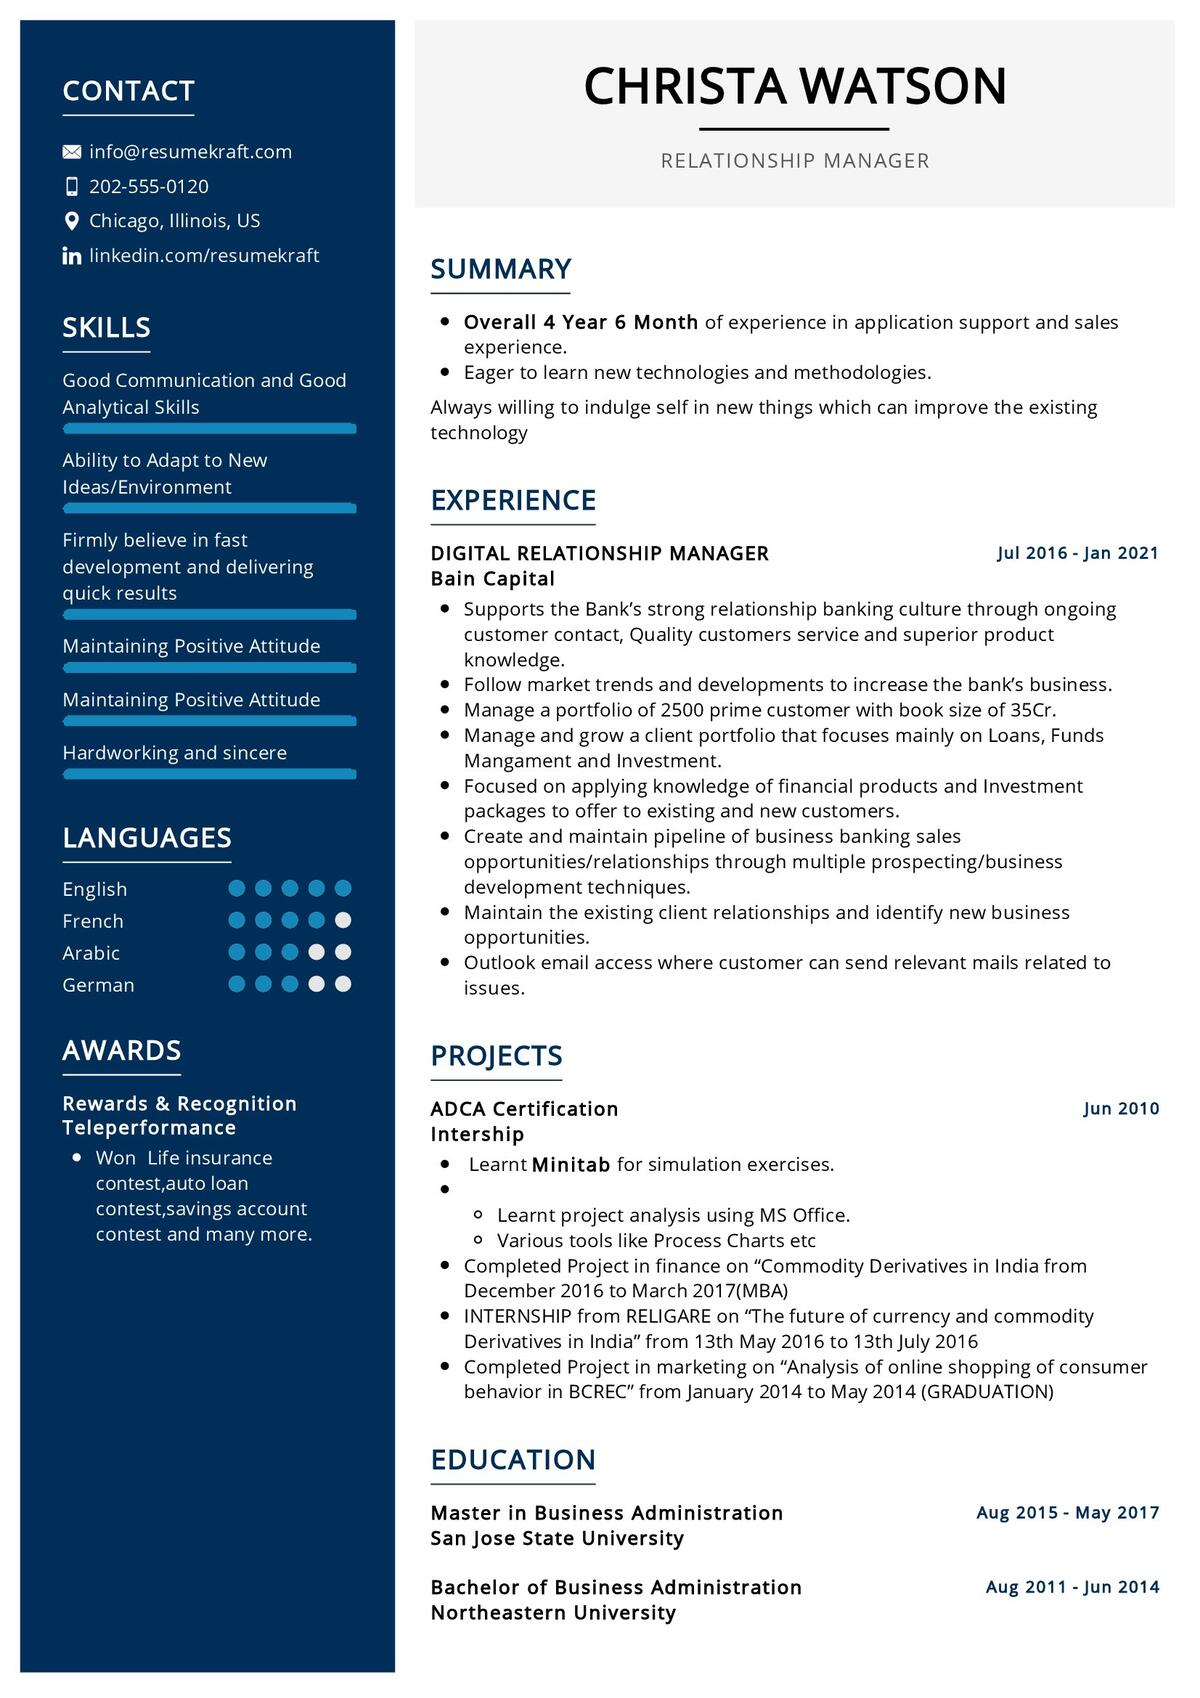 Relationship Manager Resume